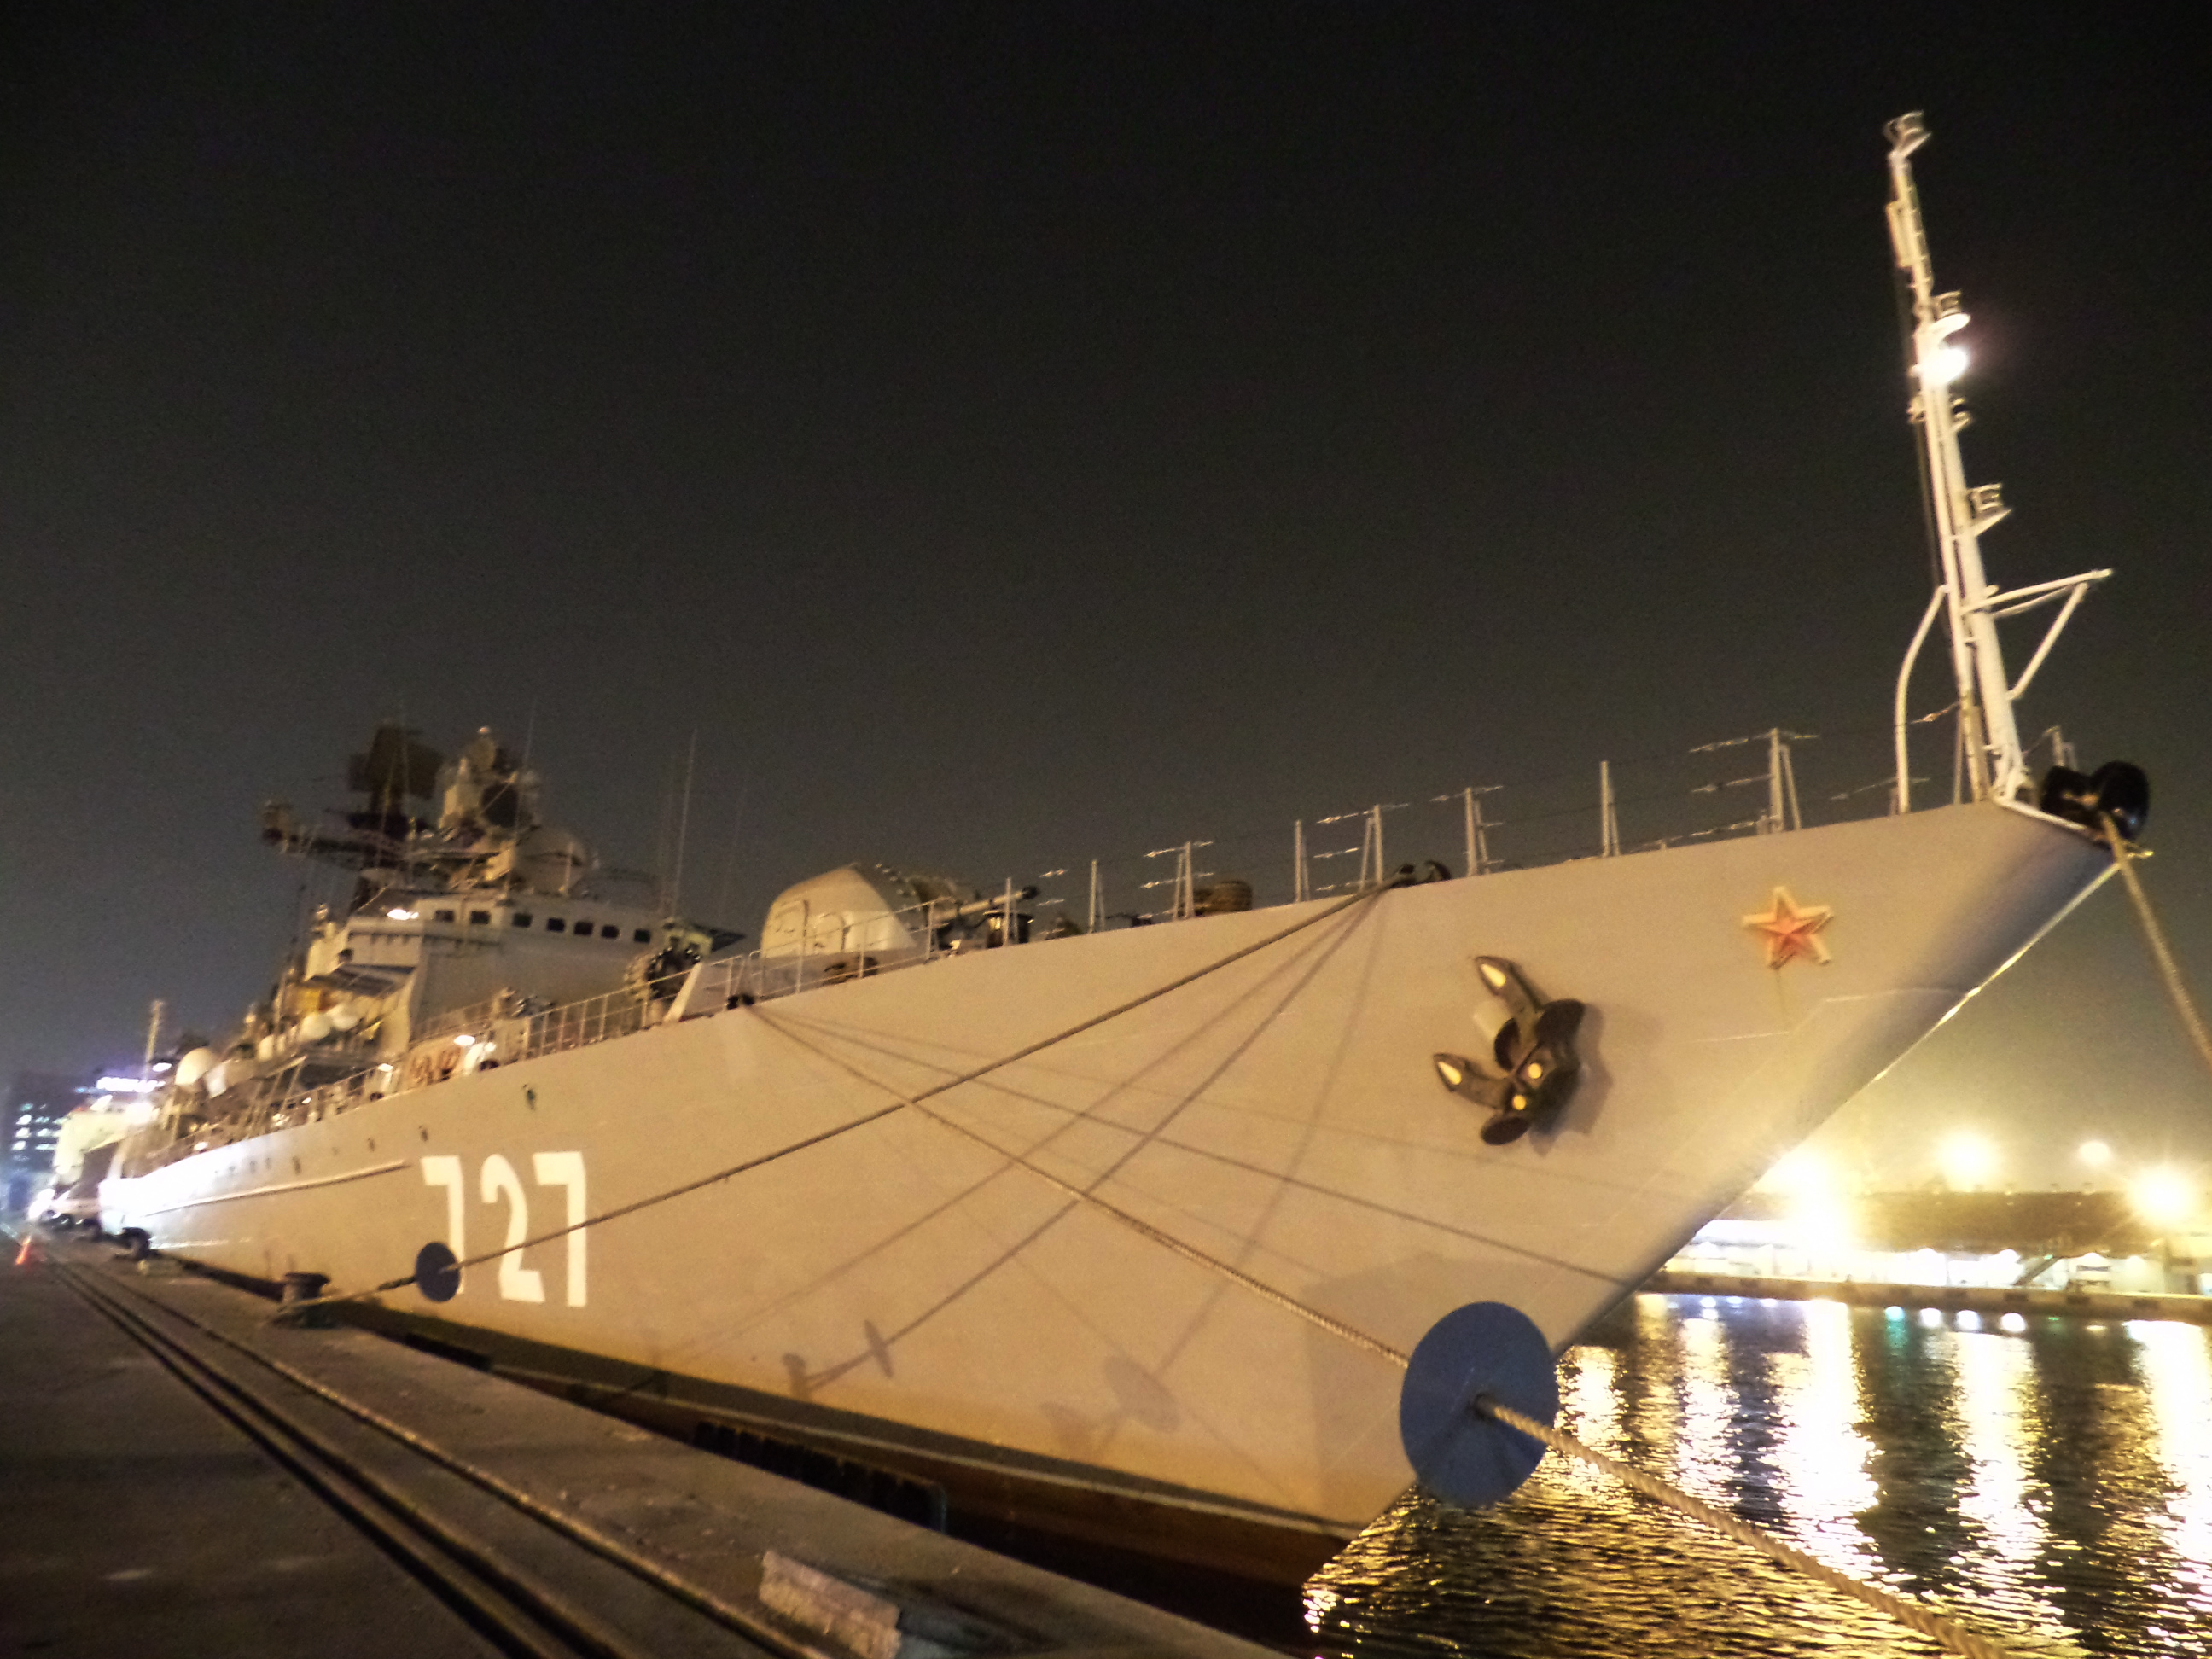 "Fregat Armada Baltik Angkatan Laut Rusia ""Yaroslav Mudry"" (727) berlabuh di pelabuhan Tanjung Priok, Jakarta, Indonesia. Kapal perang ini tiba di Jakarta pada tanggal 5 November 2014 dalam rangka menghadiri rangkaian acara INDO Defence 2014 Expo & Forum yang digelar di Jakarta, 5-8 November 2014."